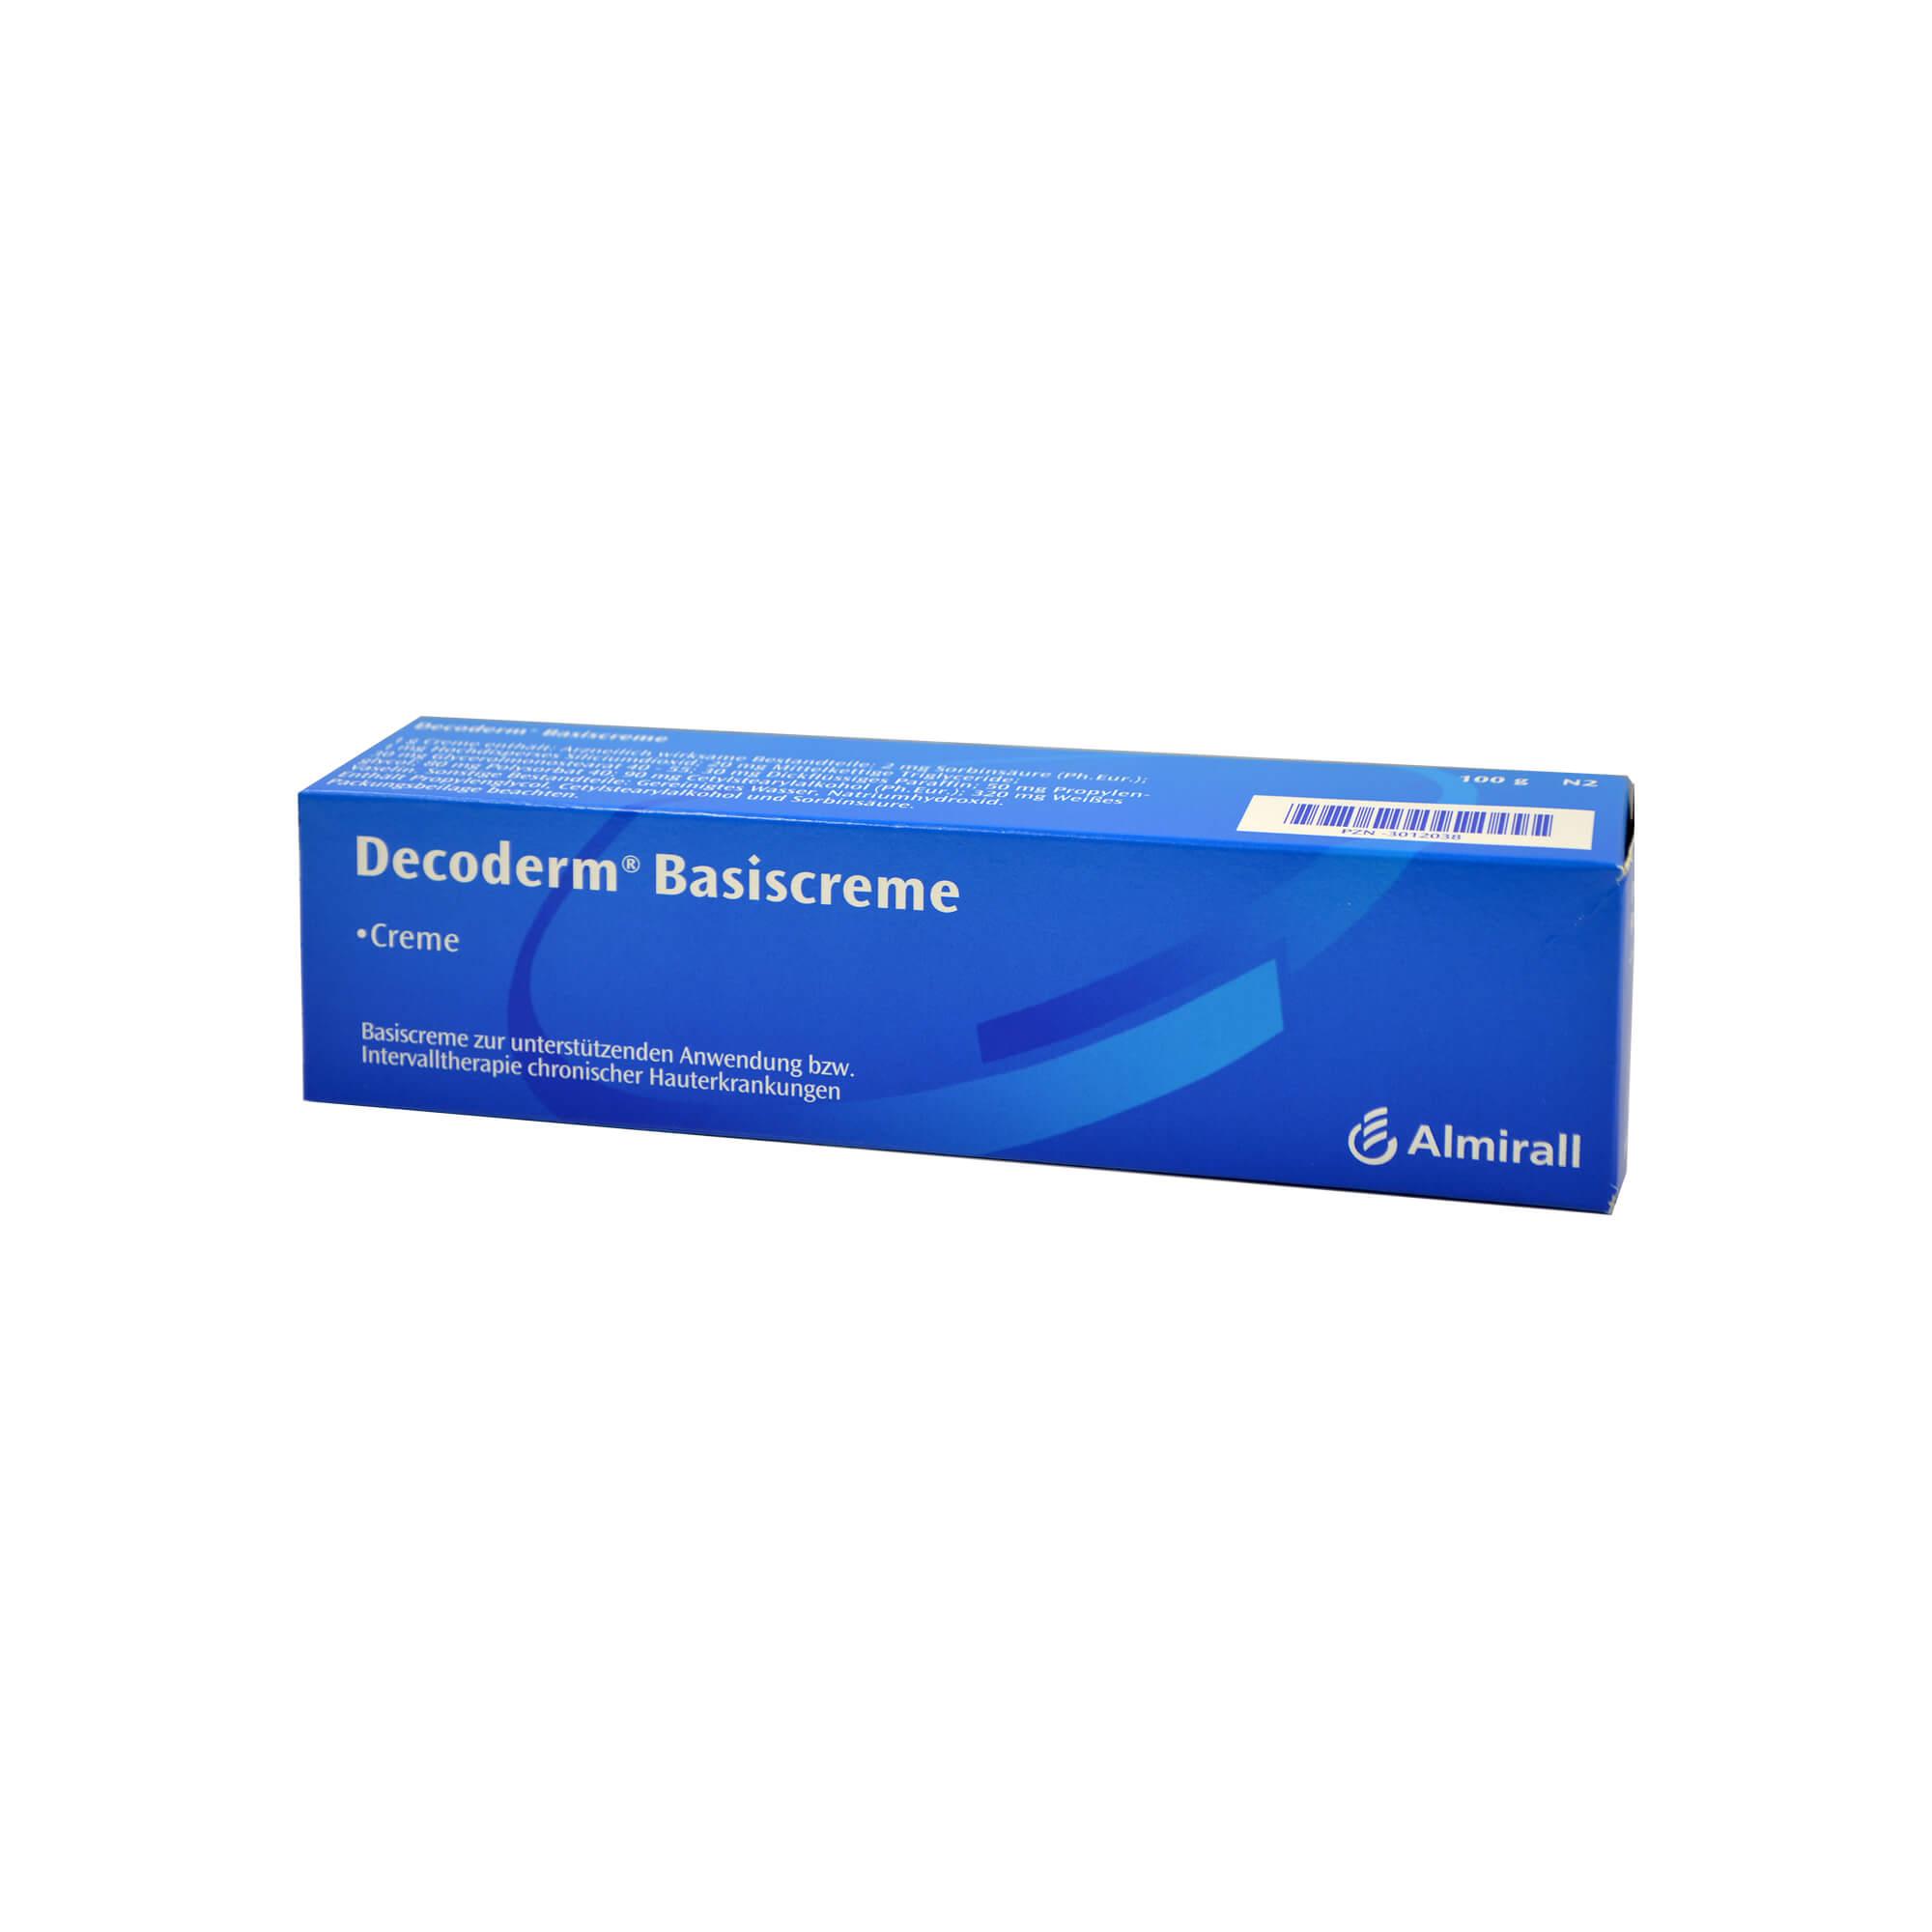 DECODERM BASISCREME, 100 g   Arzneimittel-Datenbank